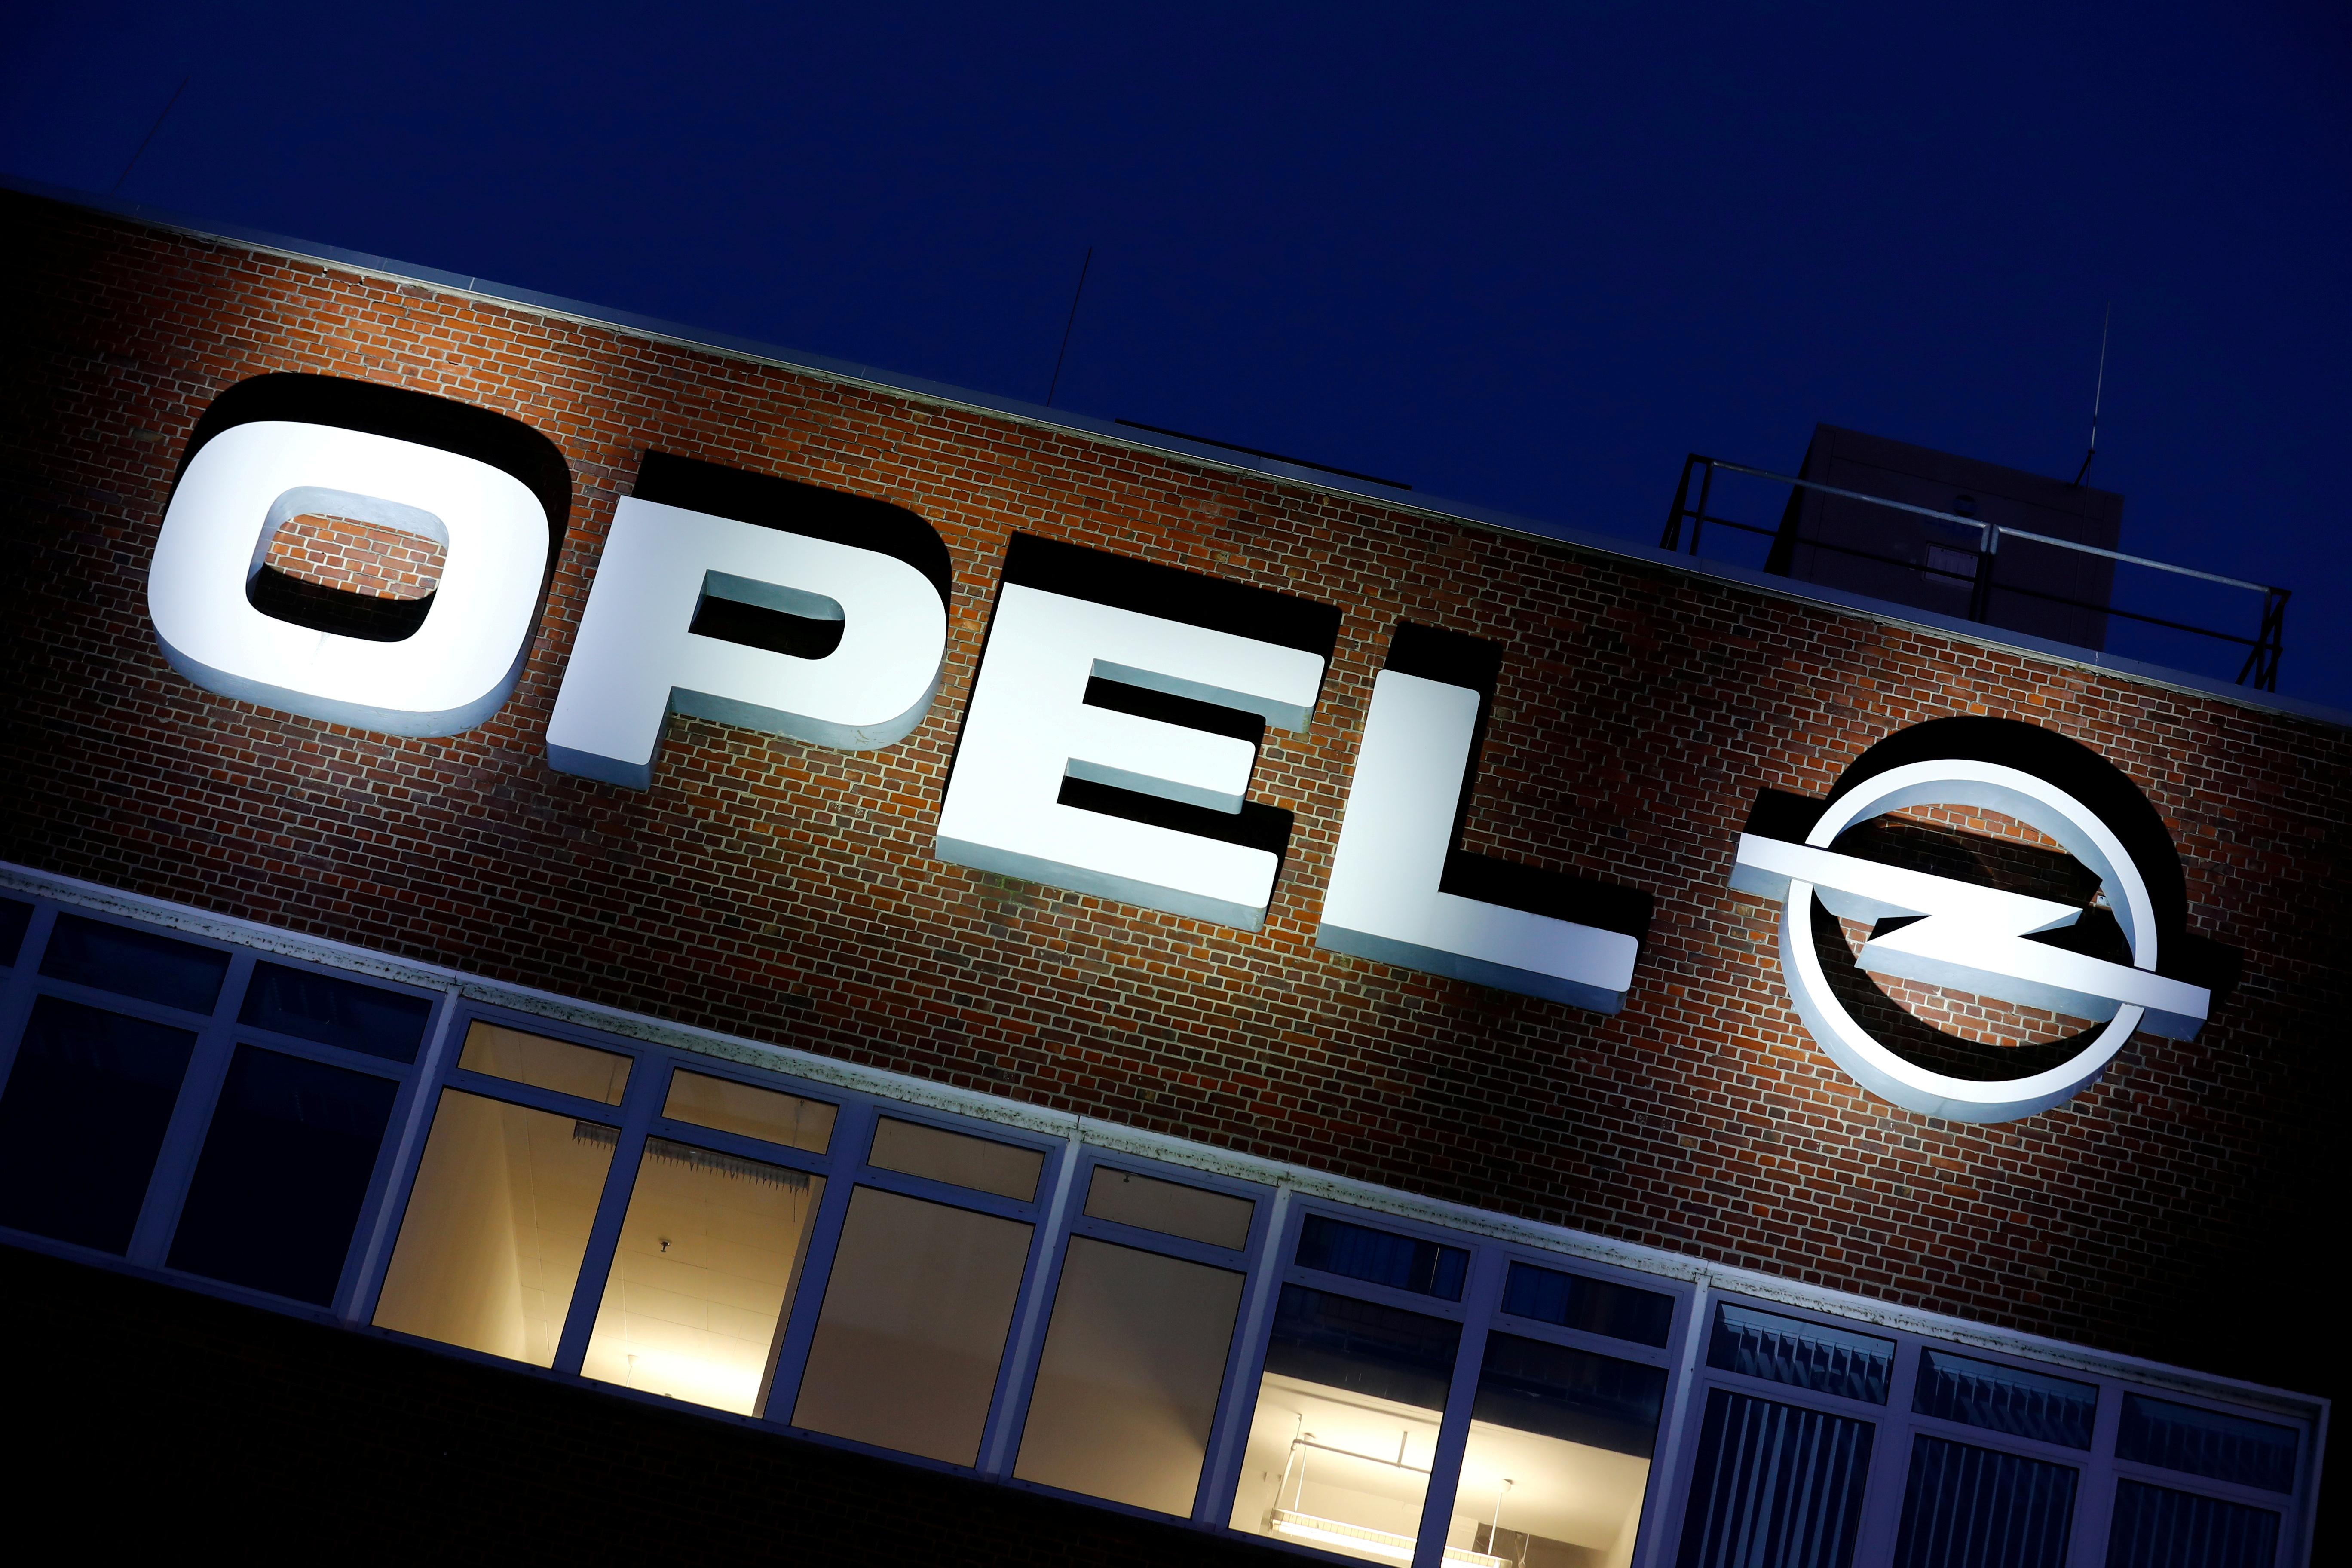 The Opel headquarters in Ruesselsheim, Germany, April 6, 2020. REUTERS/Ralph Orlowski